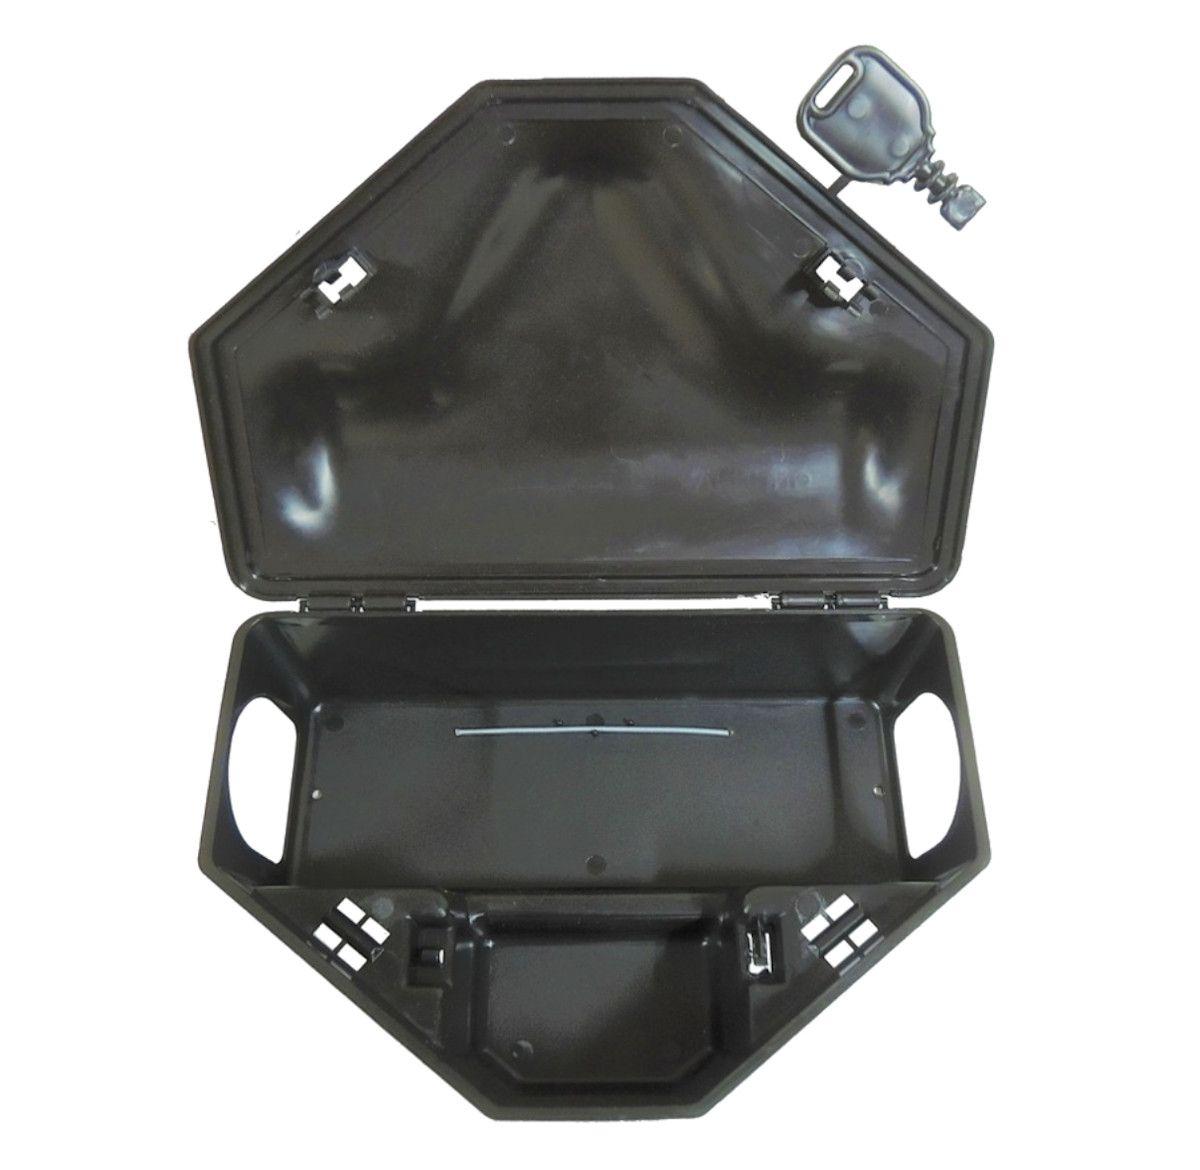 Kit 40 Porta Isca C/2 Chaves + 40 Bloco Extrusado Mata Seca